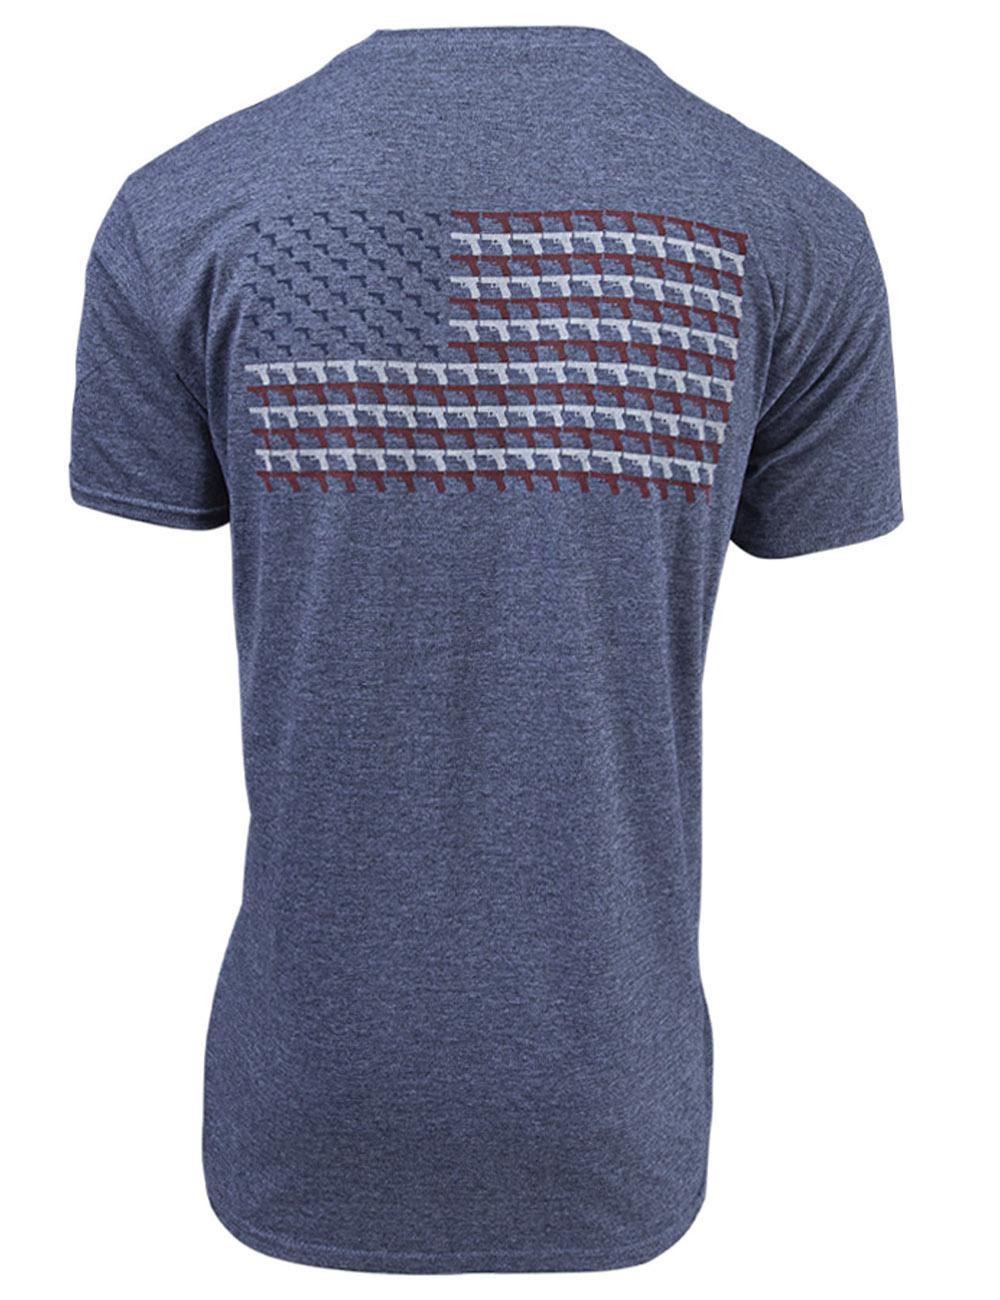 Glock Pistol Flag Short Sleeve T-shirt